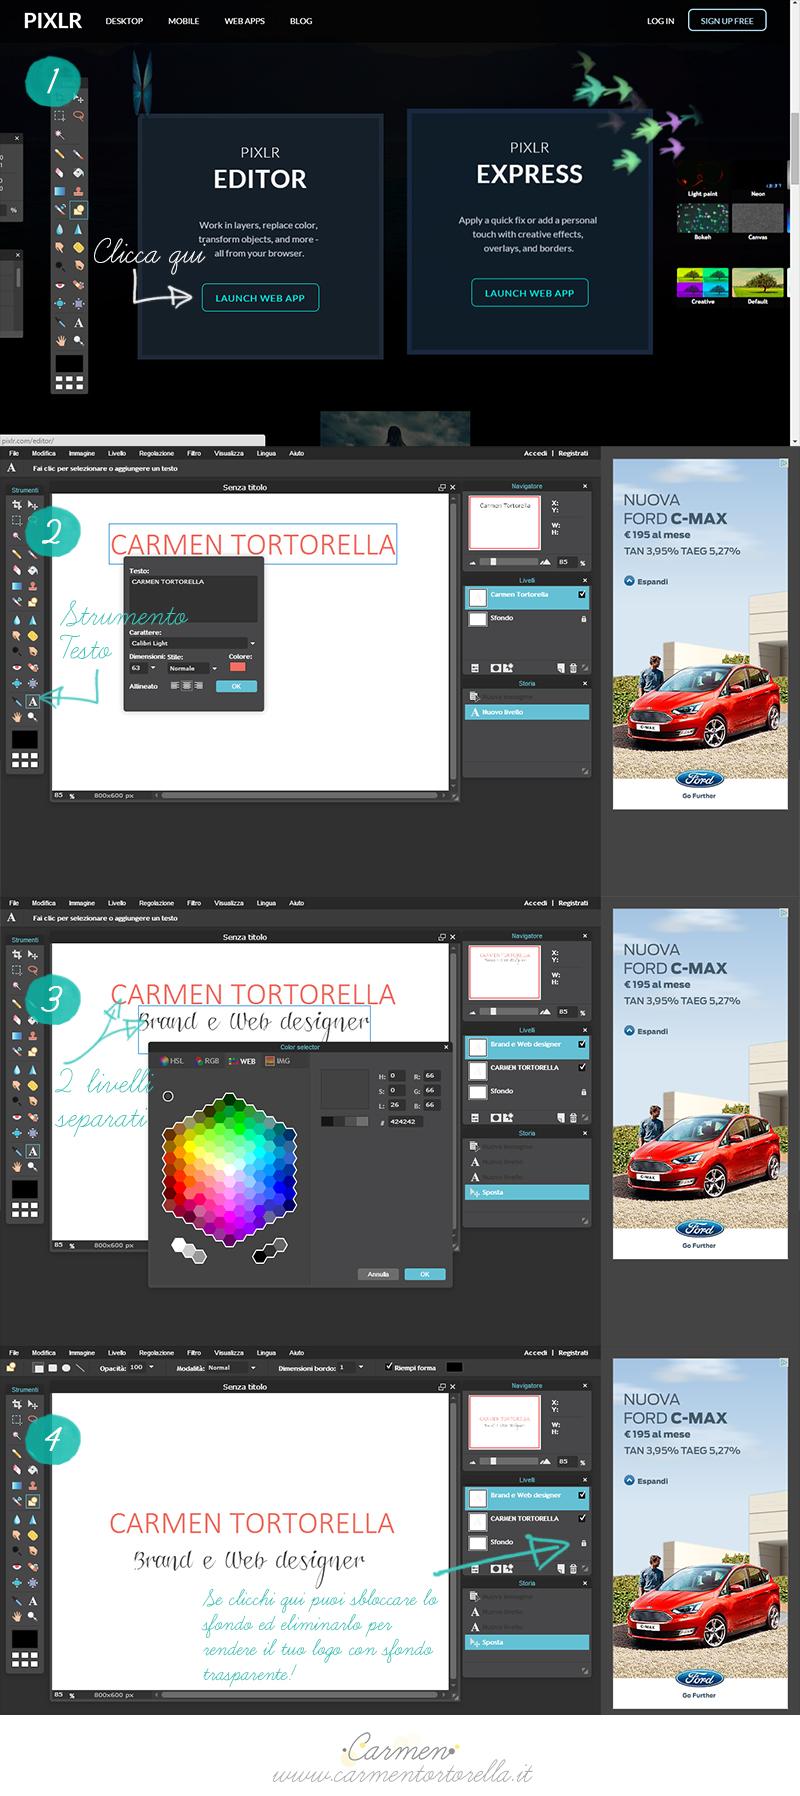 Step Pixlr Editor